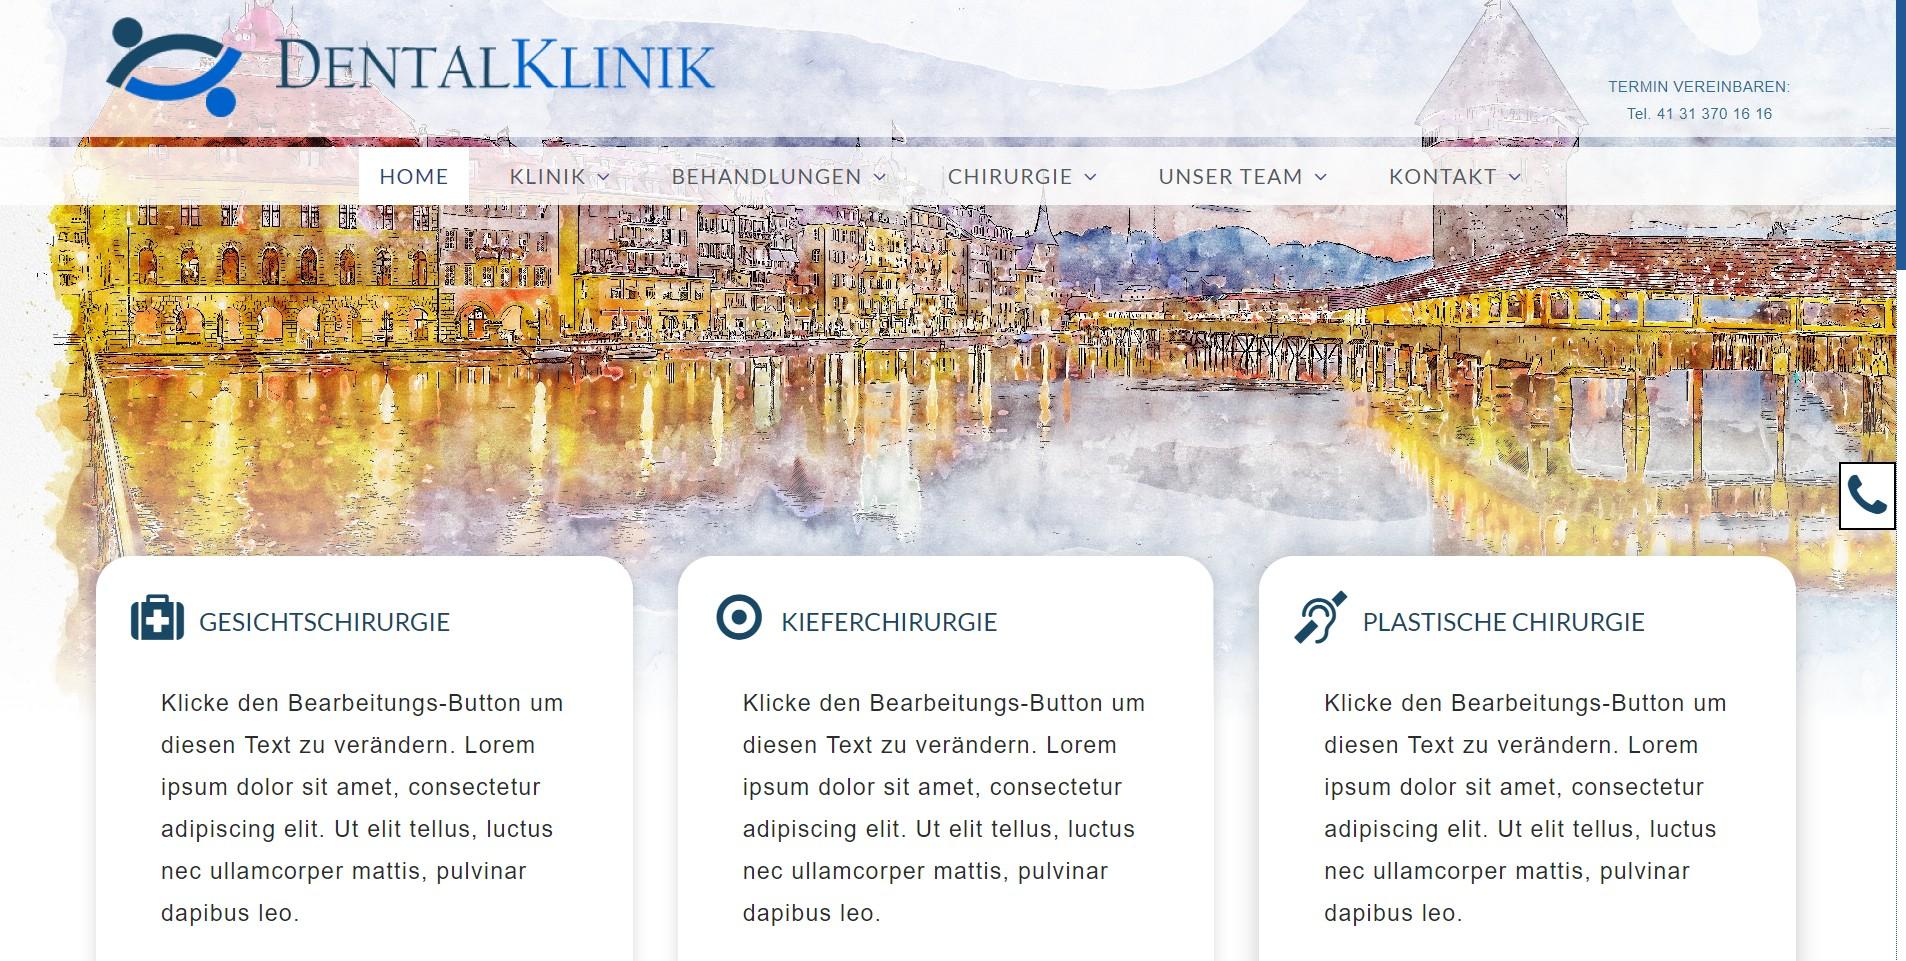 Aesthetik-Luzern.ch